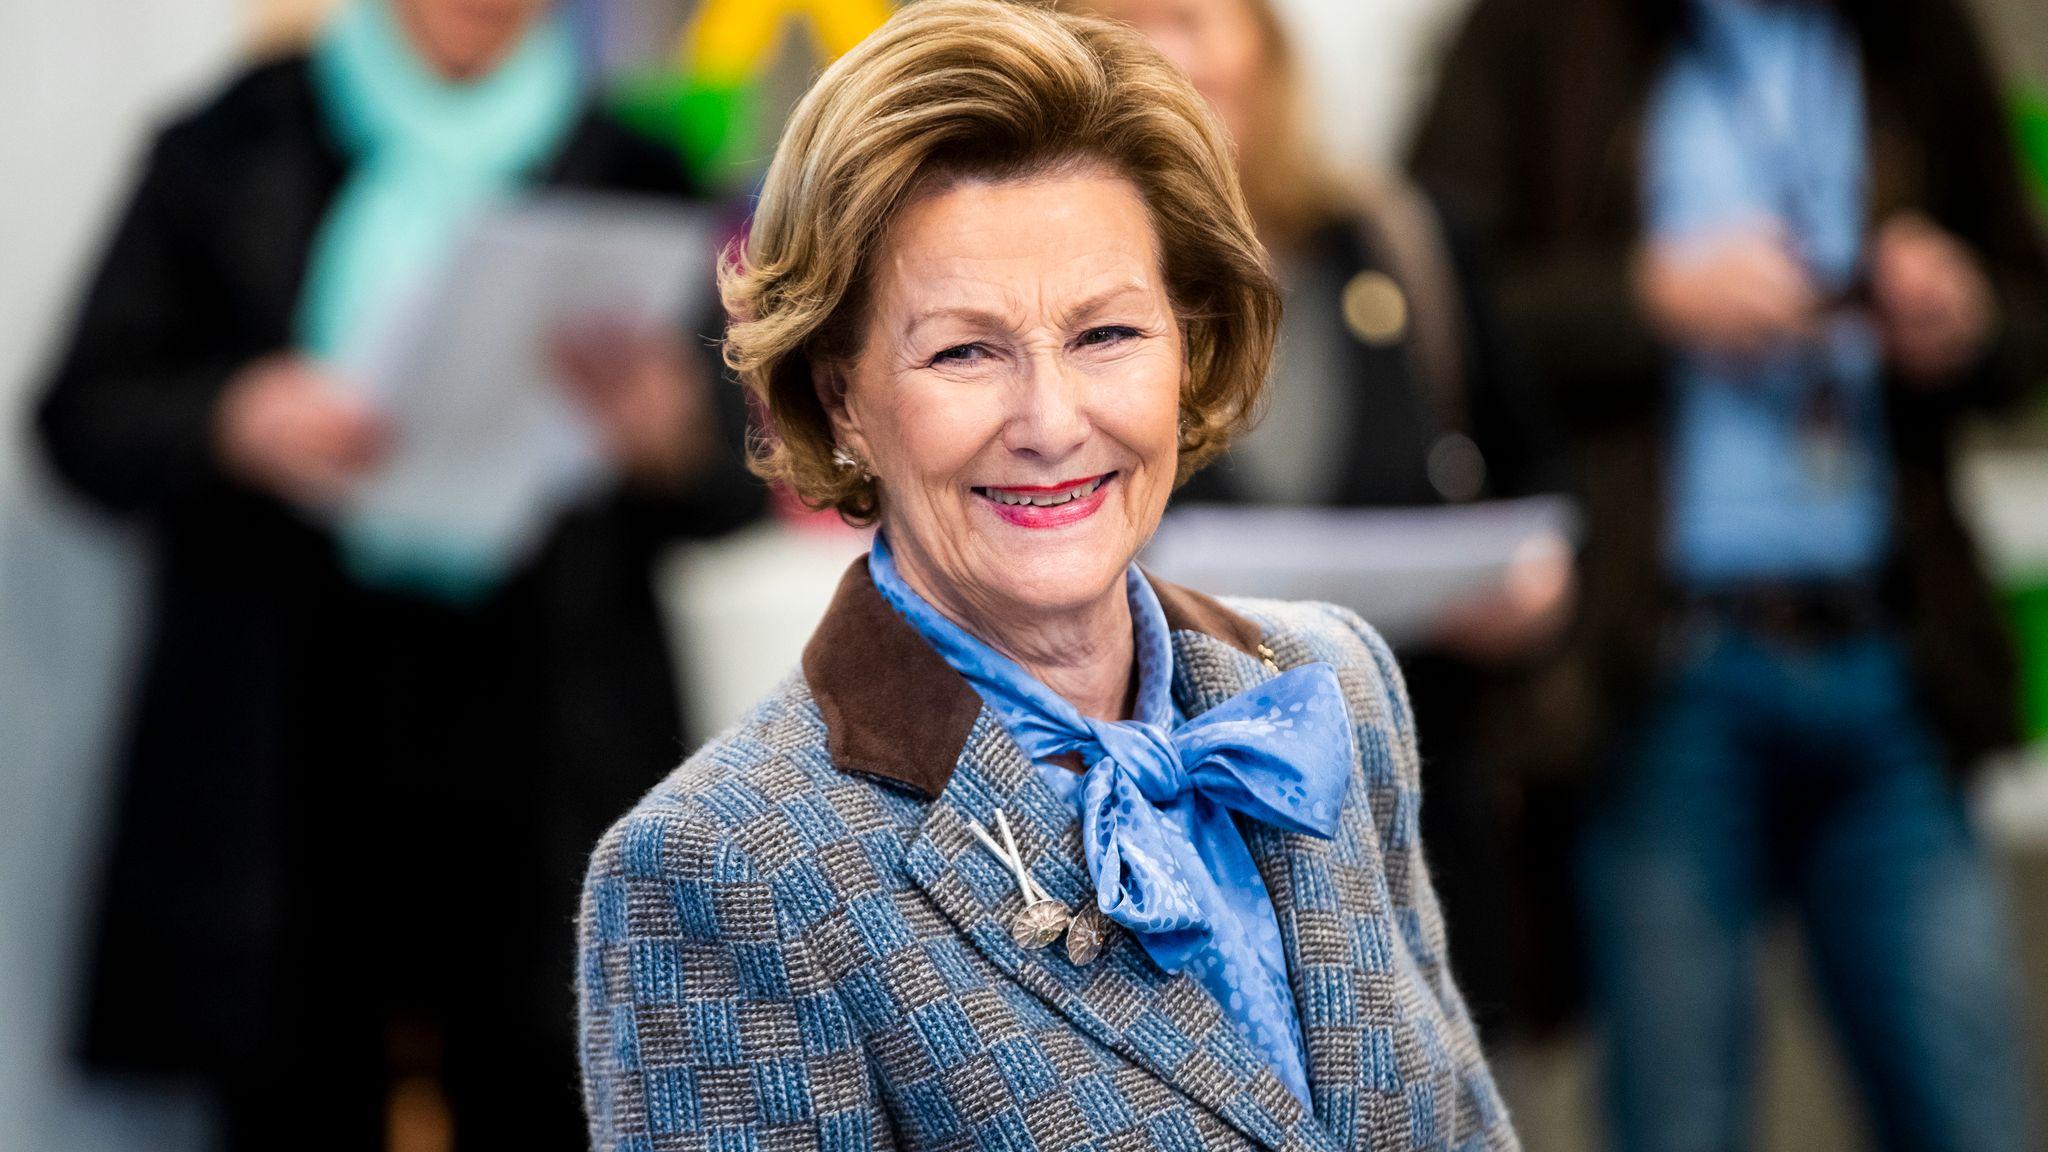 Dronning Sonja markerer 82 årsdagen med privat feiring – VG